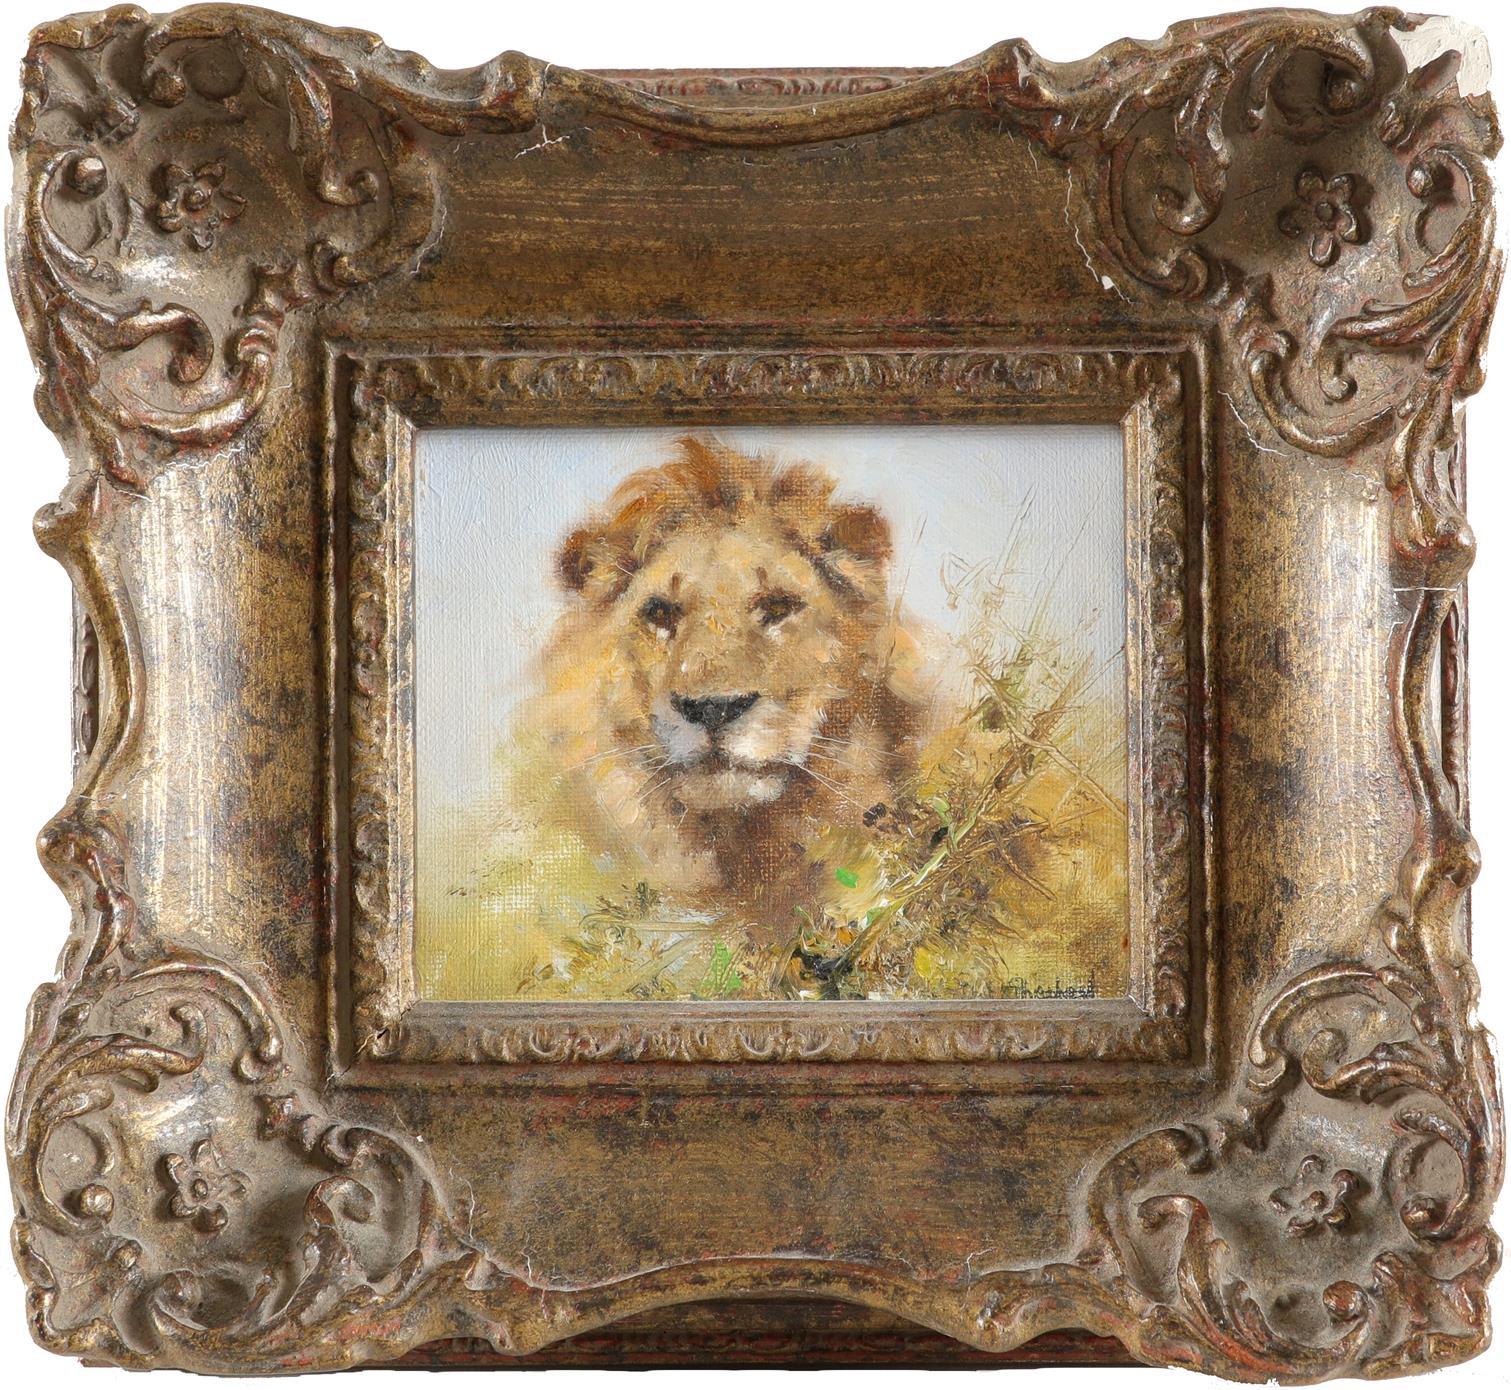 ‡David Shepherd CBE, FRSA (1931-2017) Lion Signed Da**Shepherd (lower right); signed and dated - Image 2 of 3